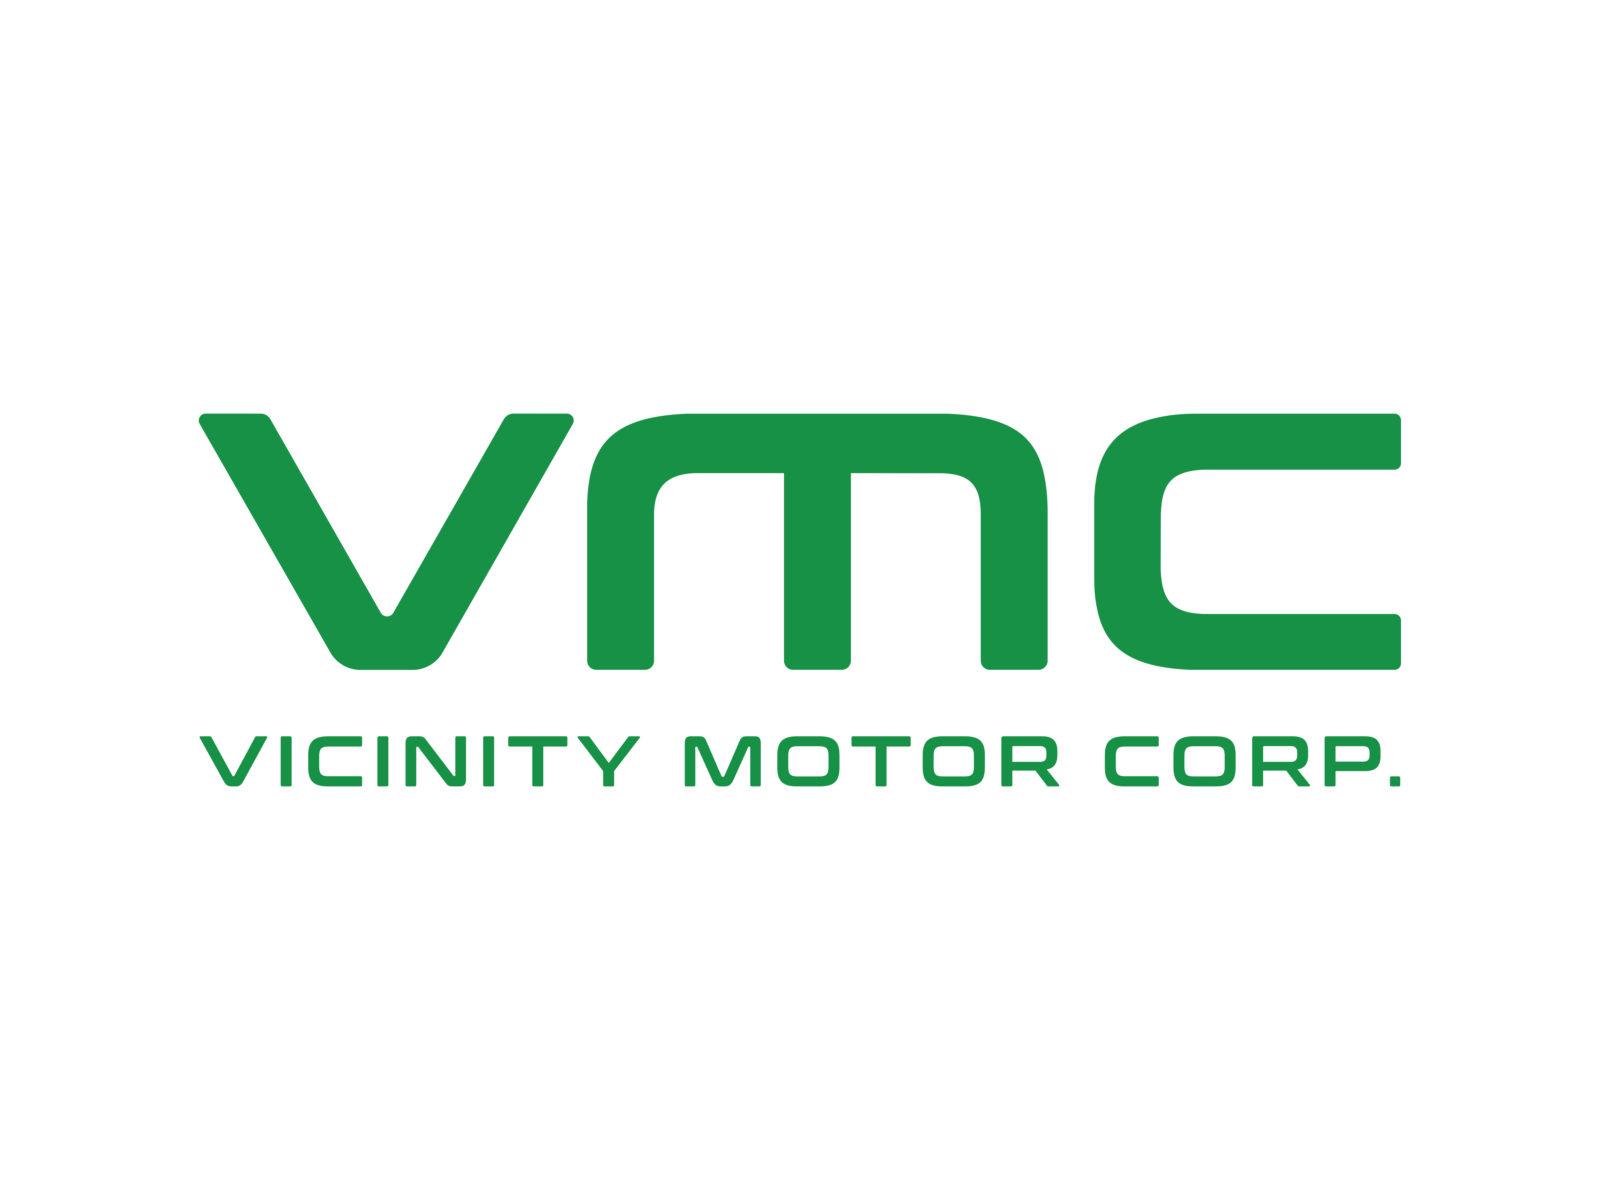 Vicinity Motor (Bus) Corp. / VMC